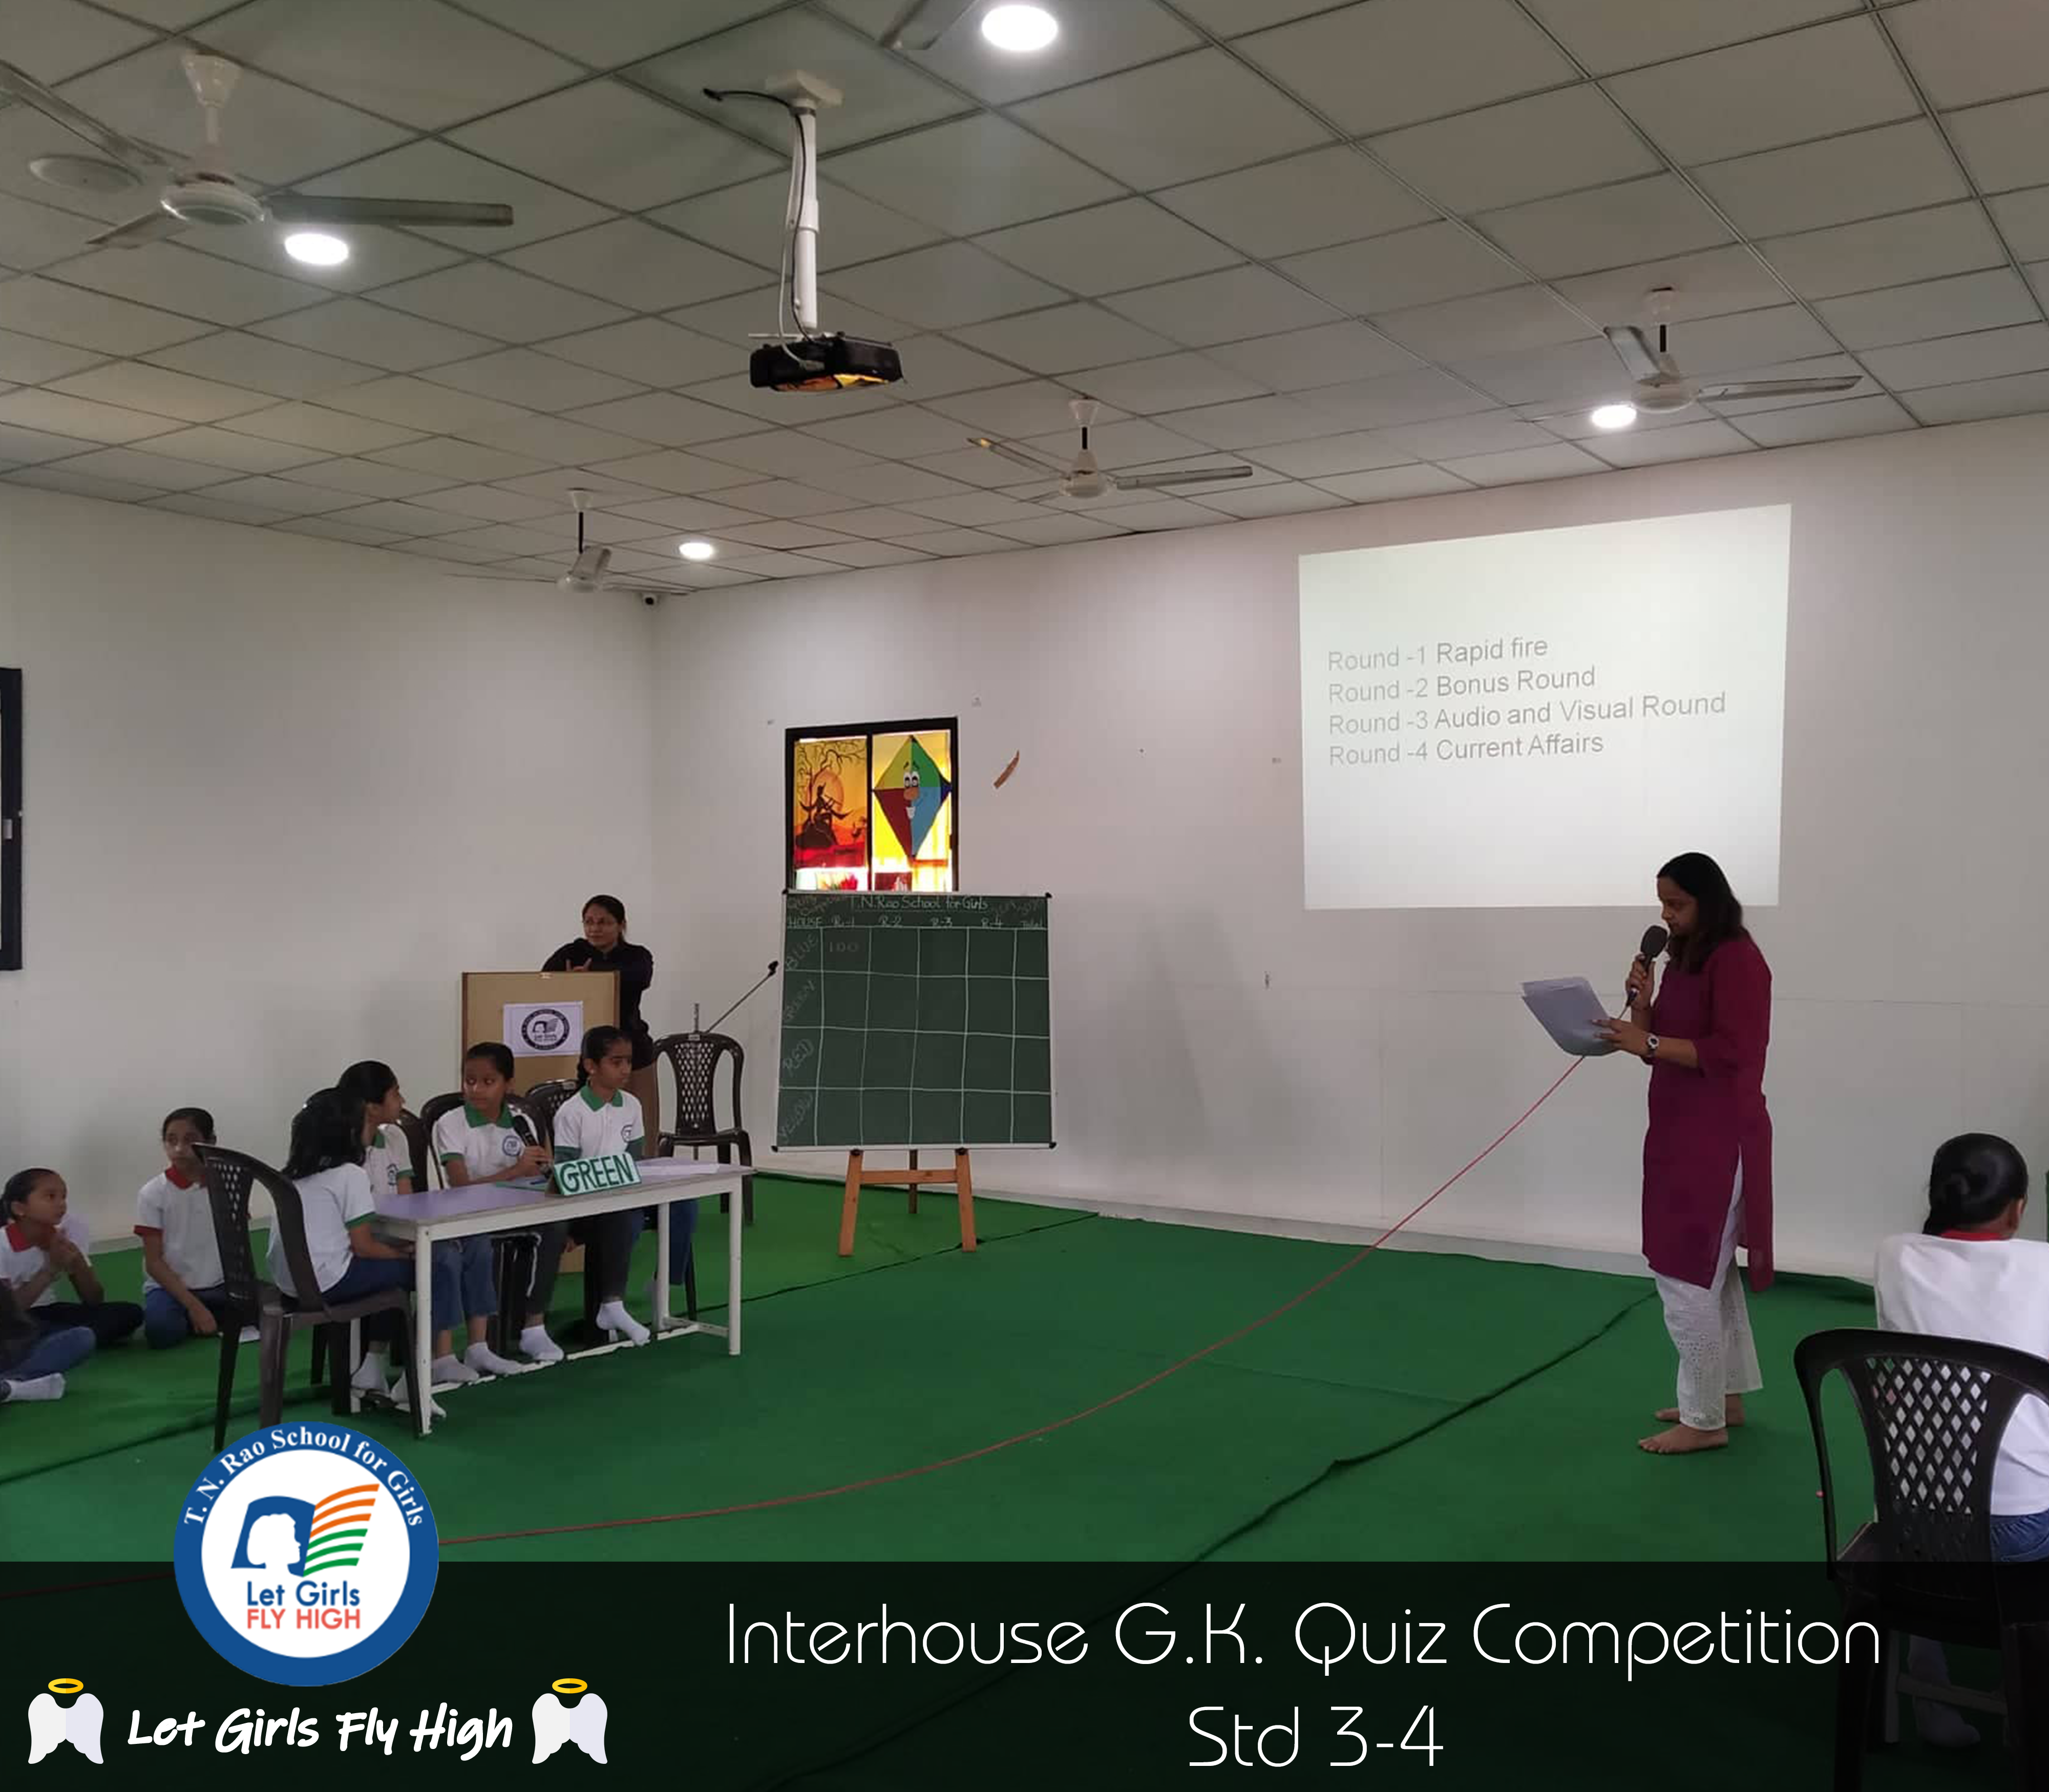 Interhouse G.K. Quiz Competition